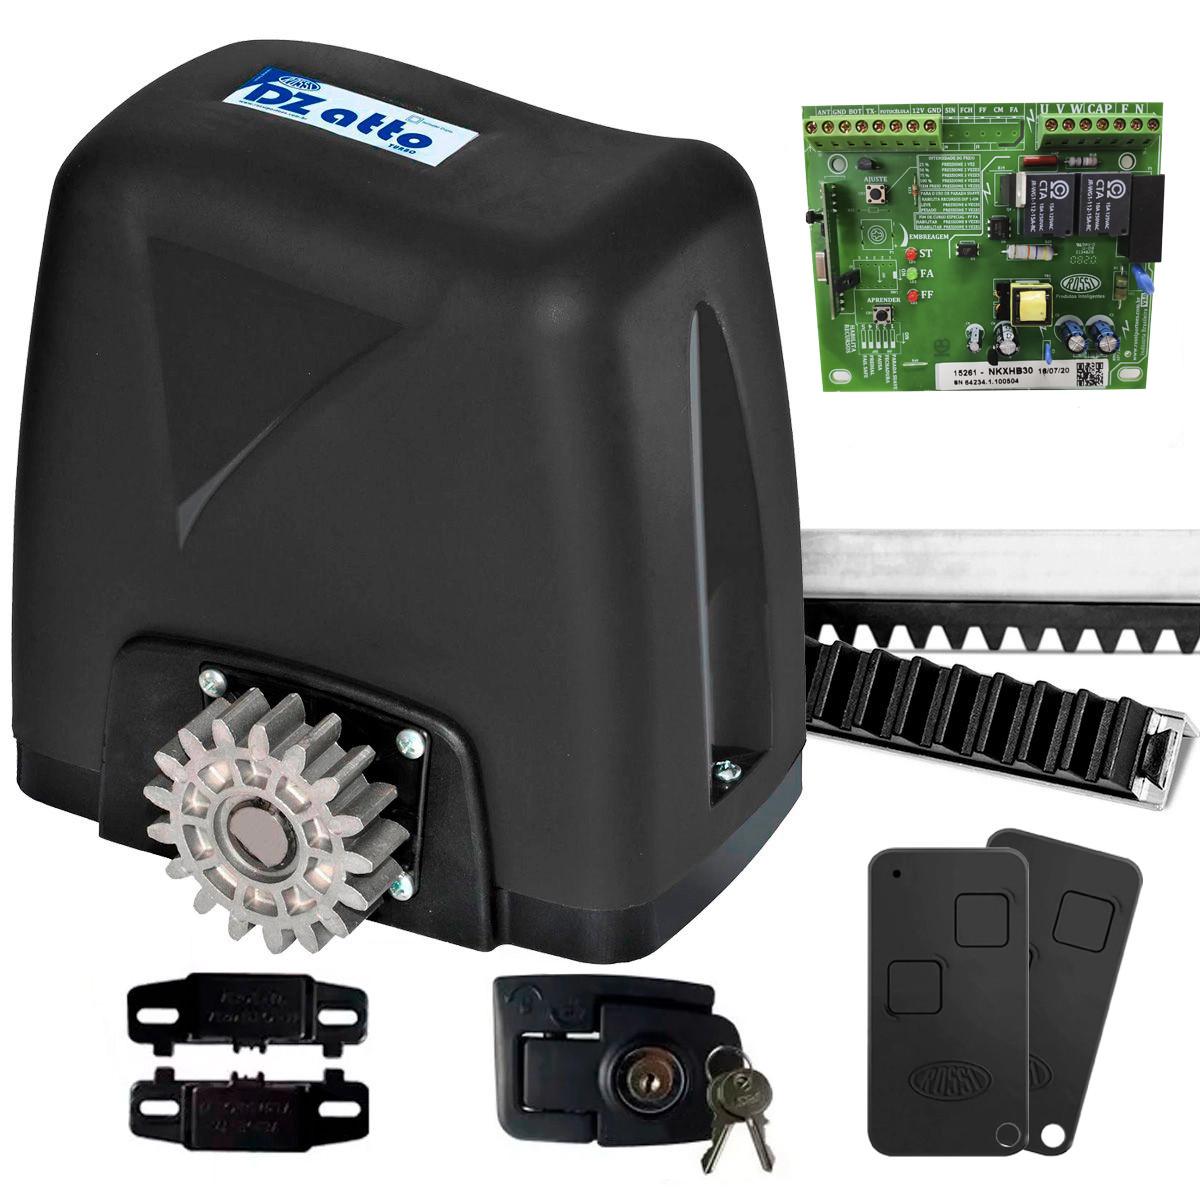 motor-de-portao/motor-de-portao-deslizante/kit-motor-completo/kit-motor-portao-rossi-dz-nano-turbo-600kg-14-deslizante-automatico-de-correr-eletronico-com-abertura-rapida-cremalheira